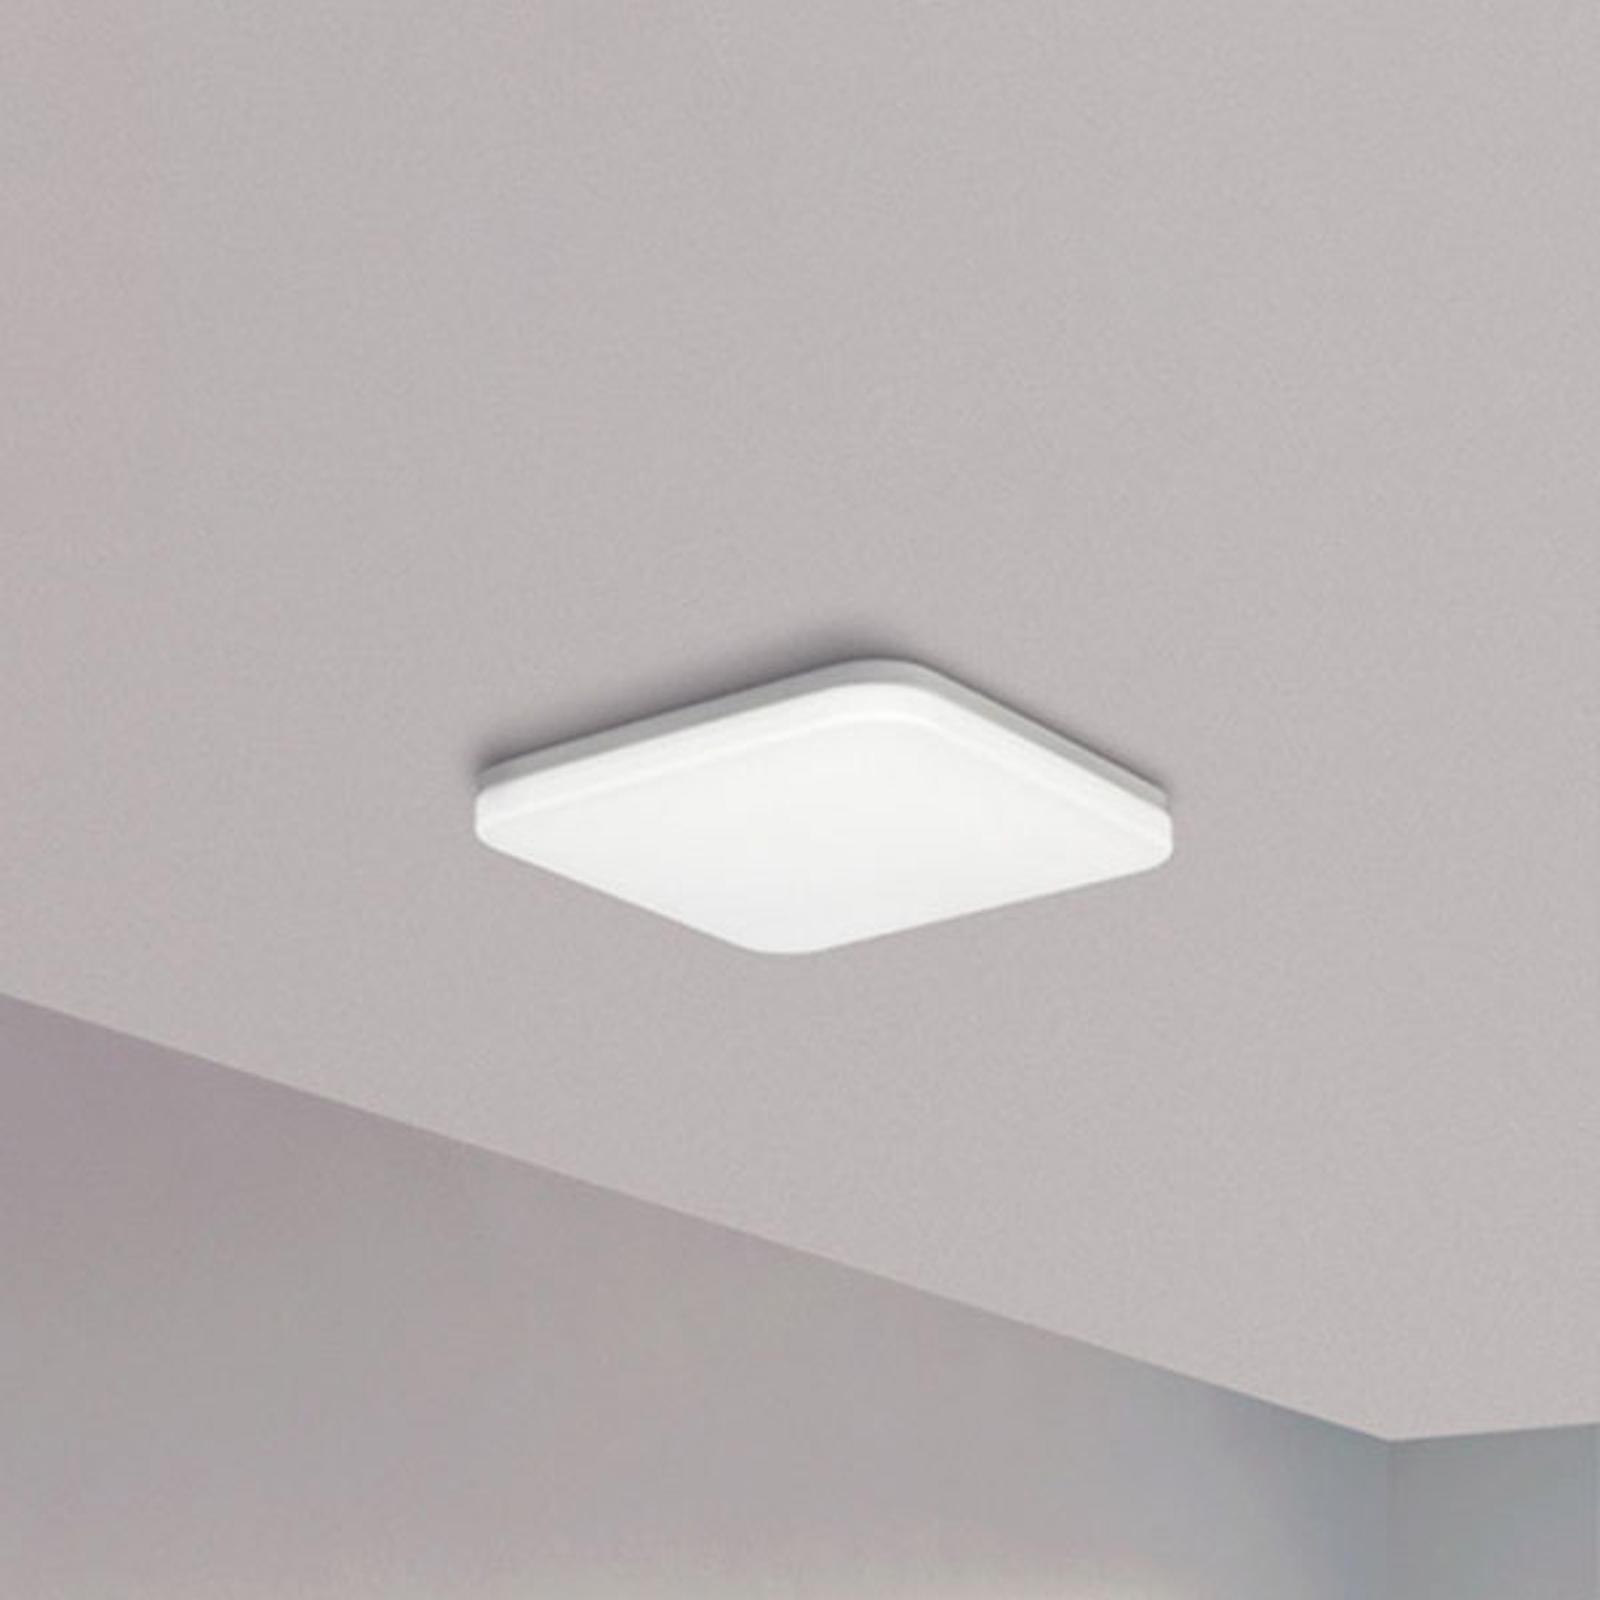 LED-Deckenlampe Uzza, Triac, 3.000K, mit Casambi